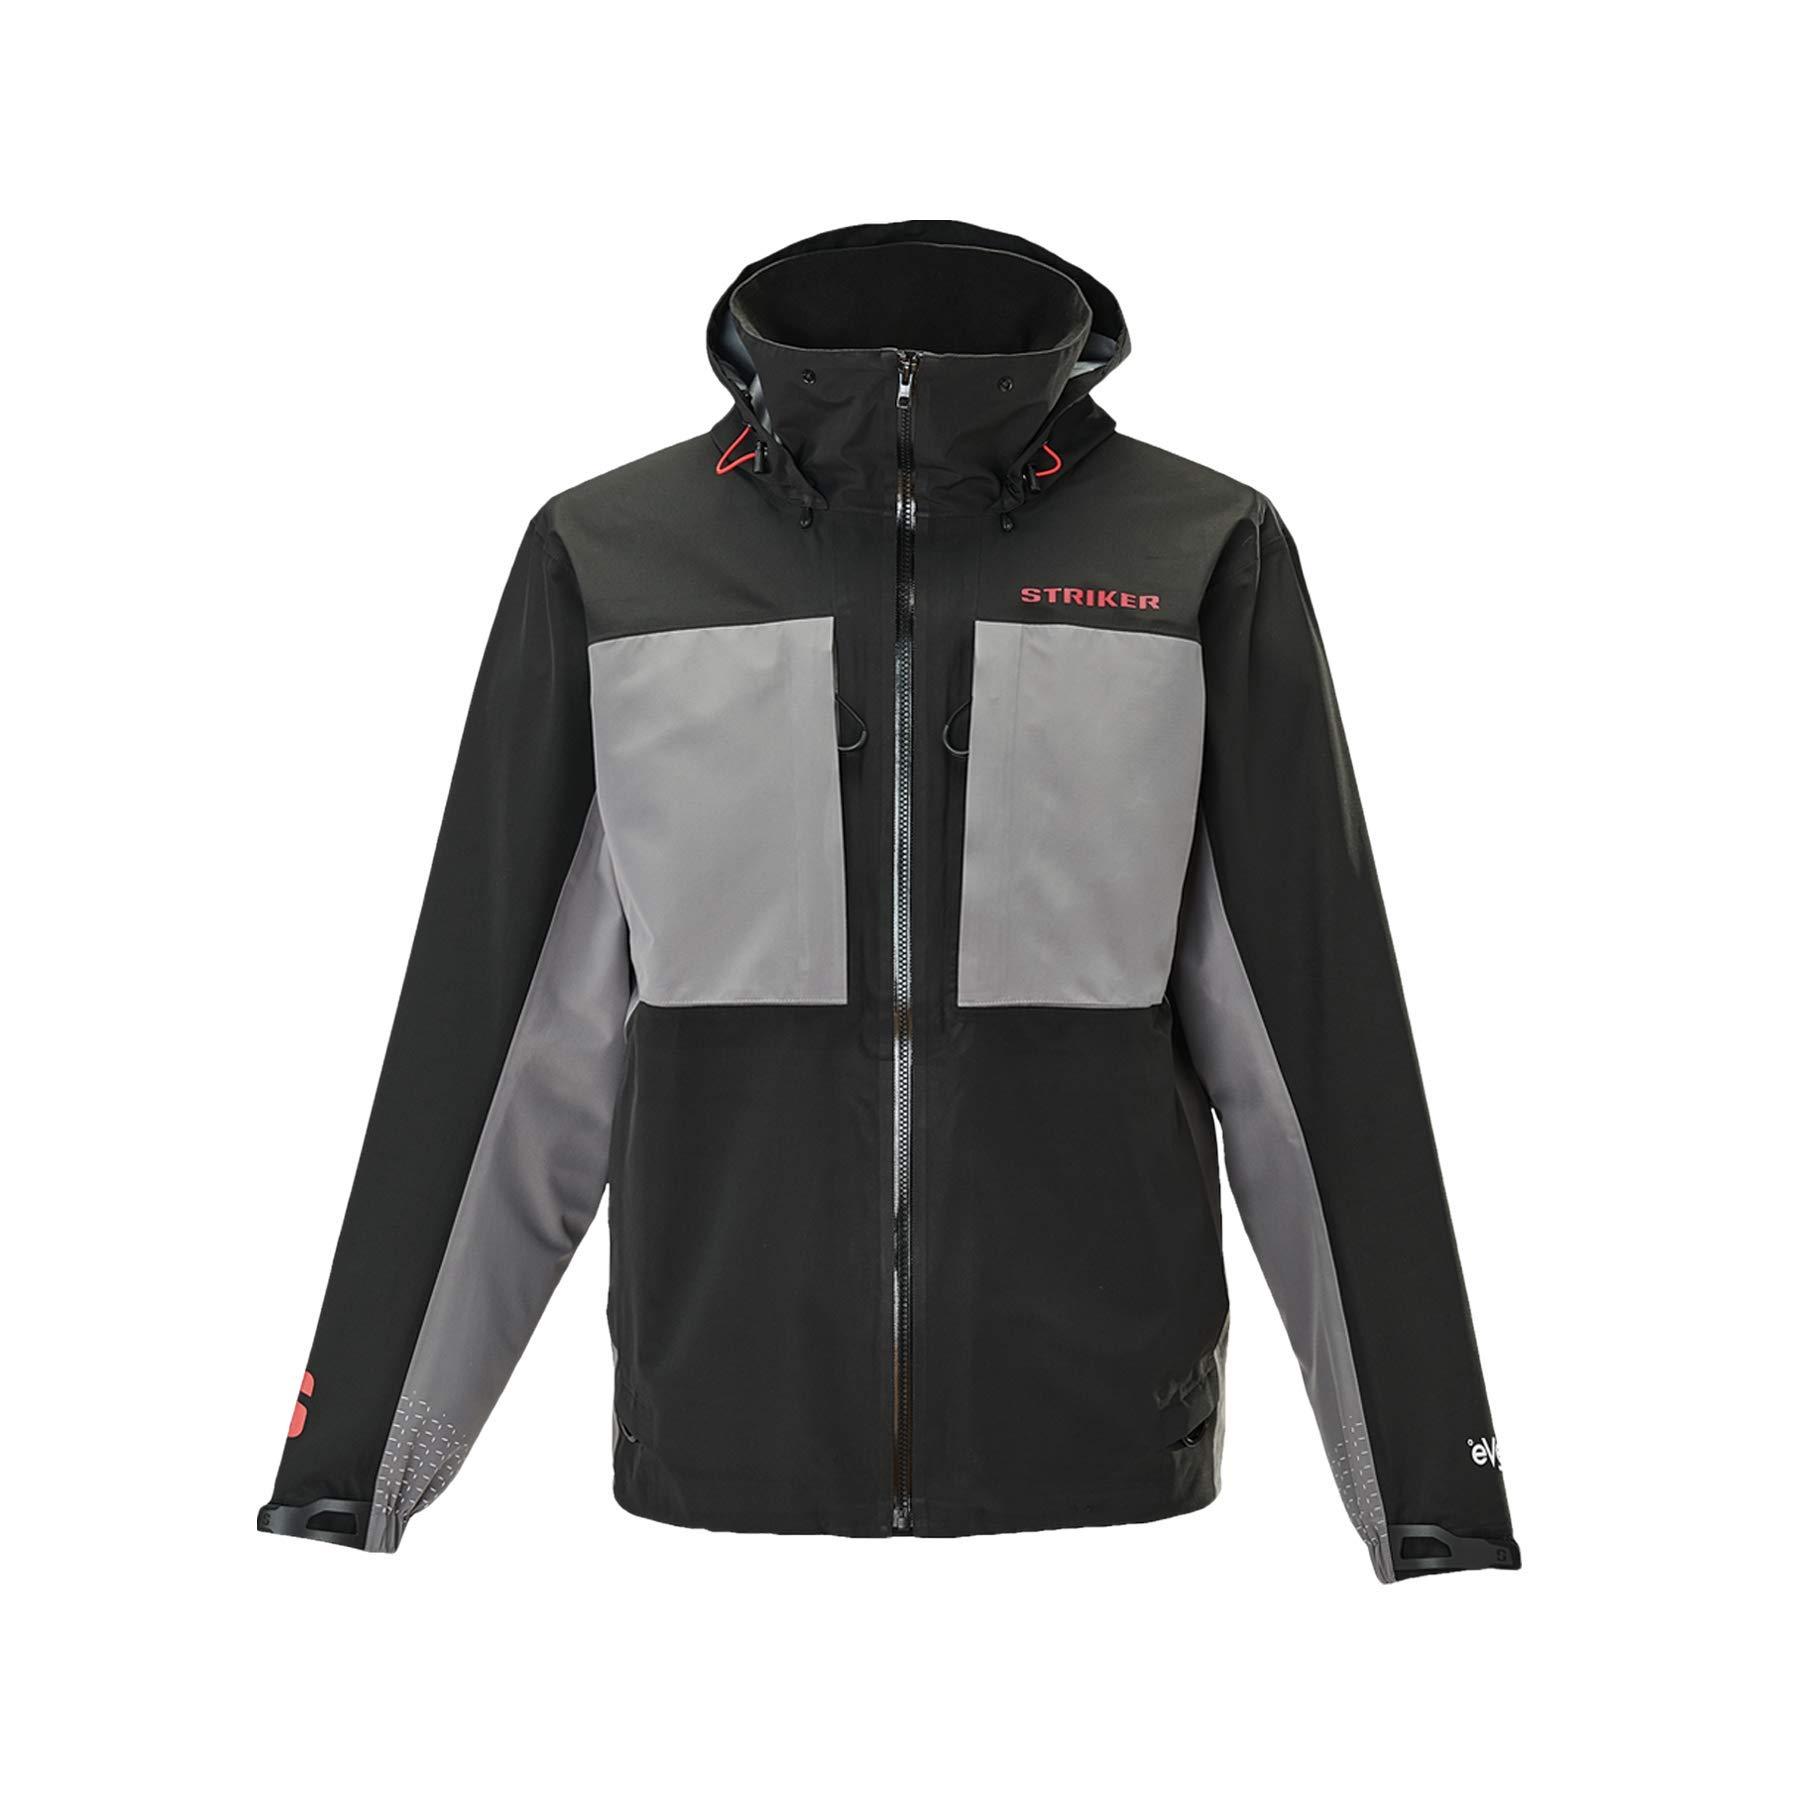 Striker eVolve Rain Jacket